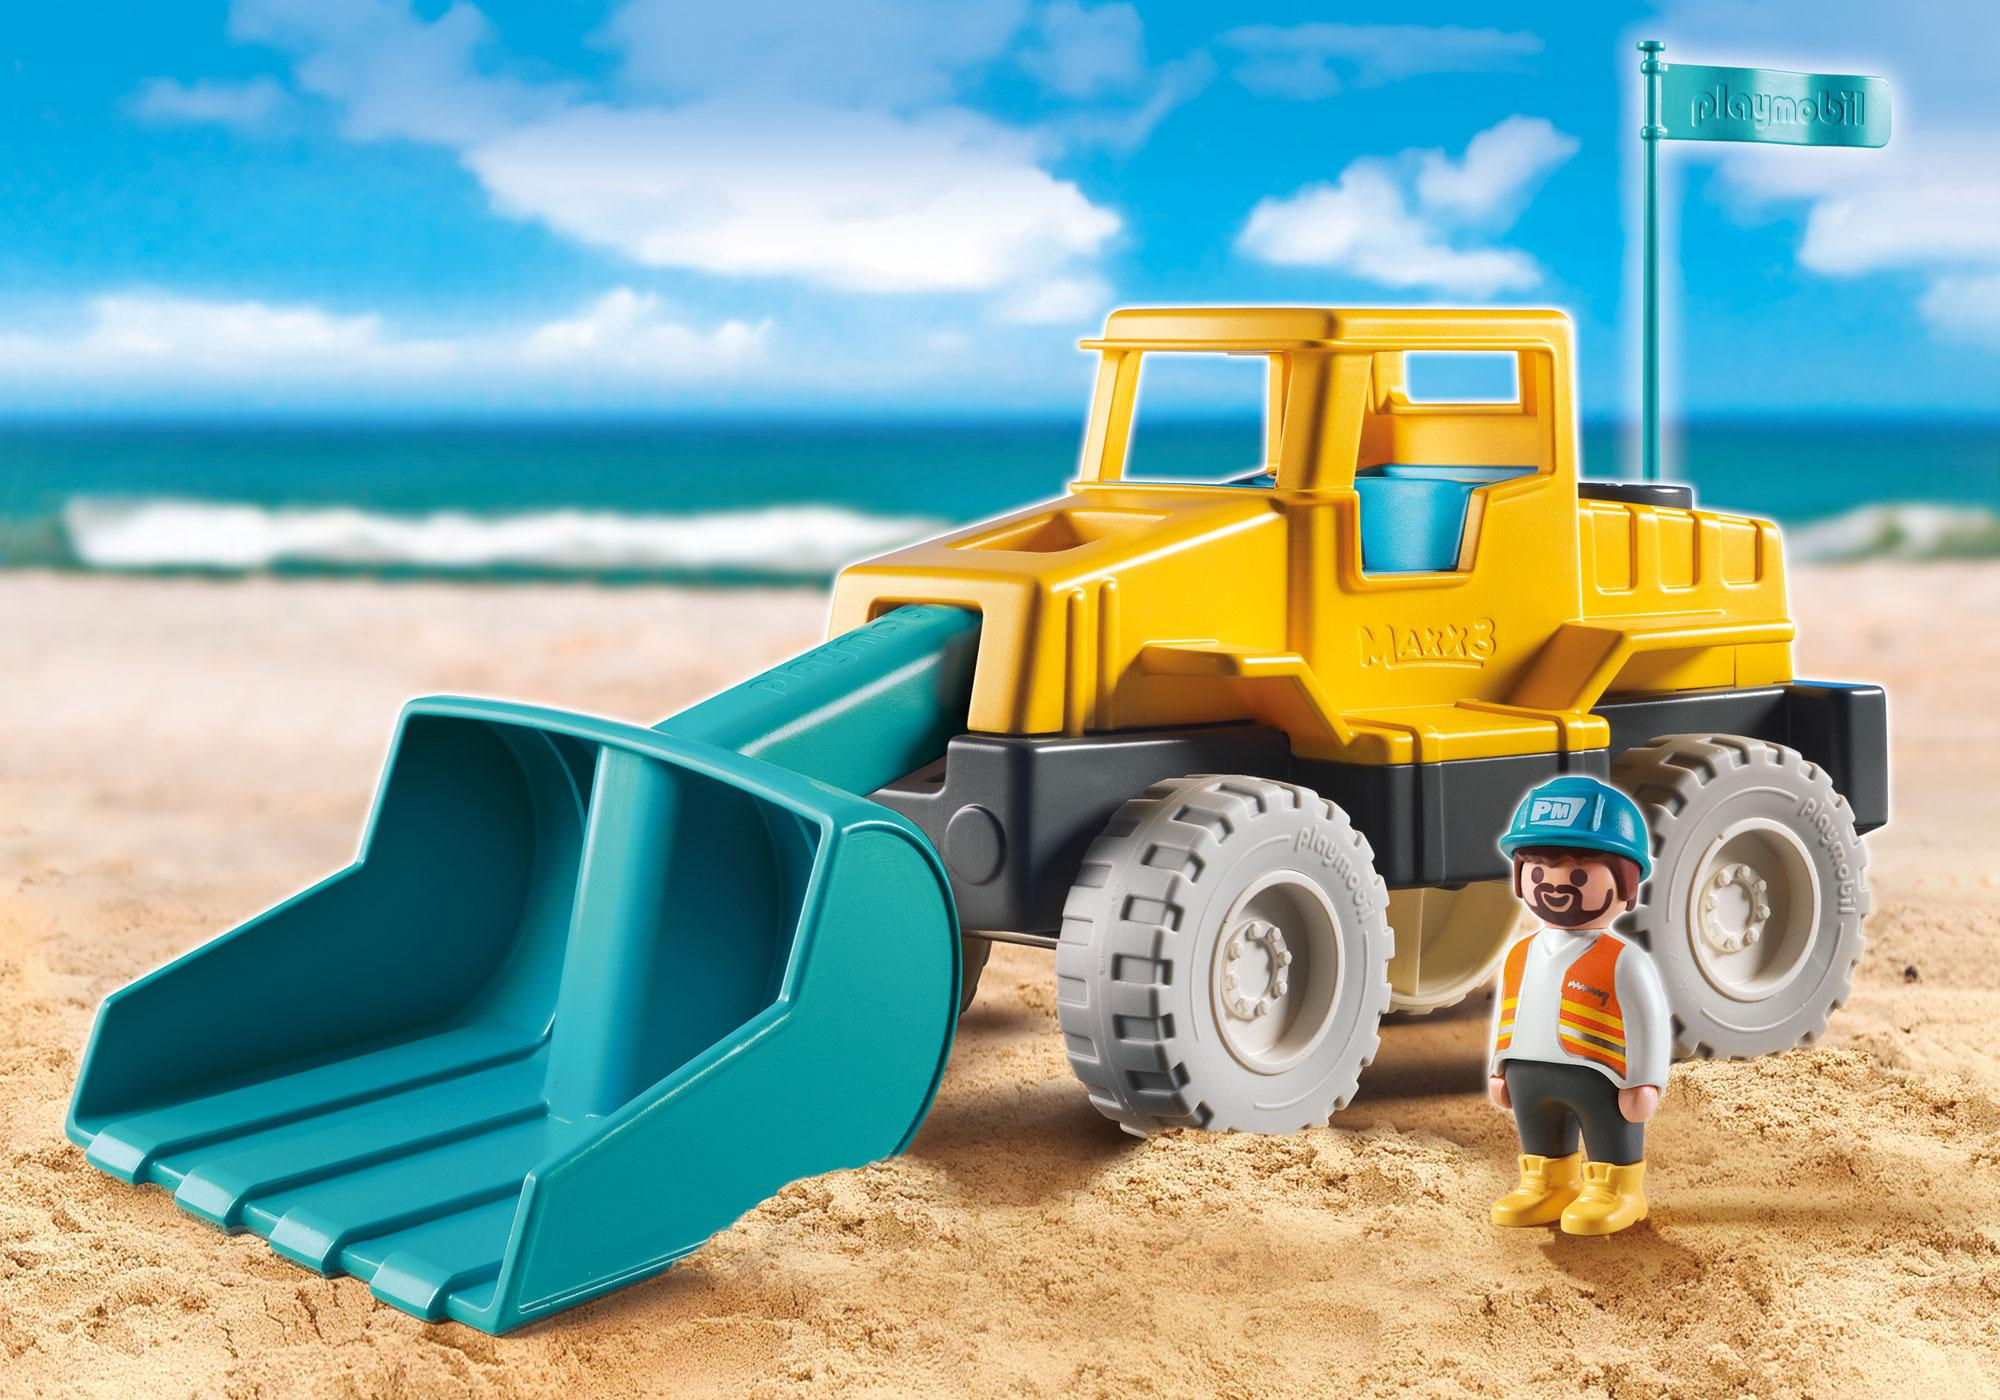 http://media.playmobil.com/i/playmobil/9145_product_detail/Excavator